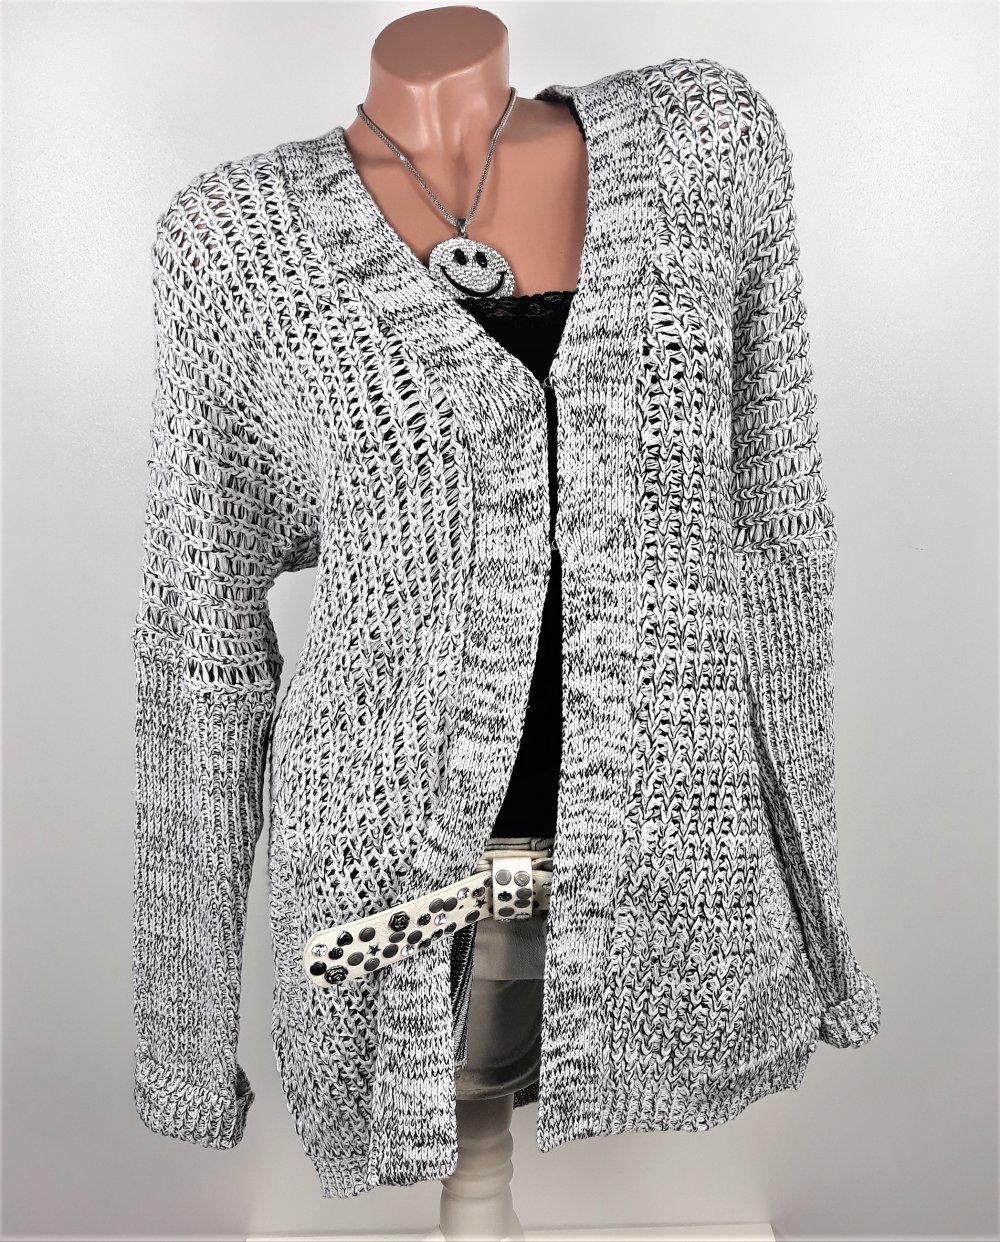 329809f9e1592d ... Strickjacke Cardigan Grobstrick Jacke Oversize grau meliert Größe 40 42  .